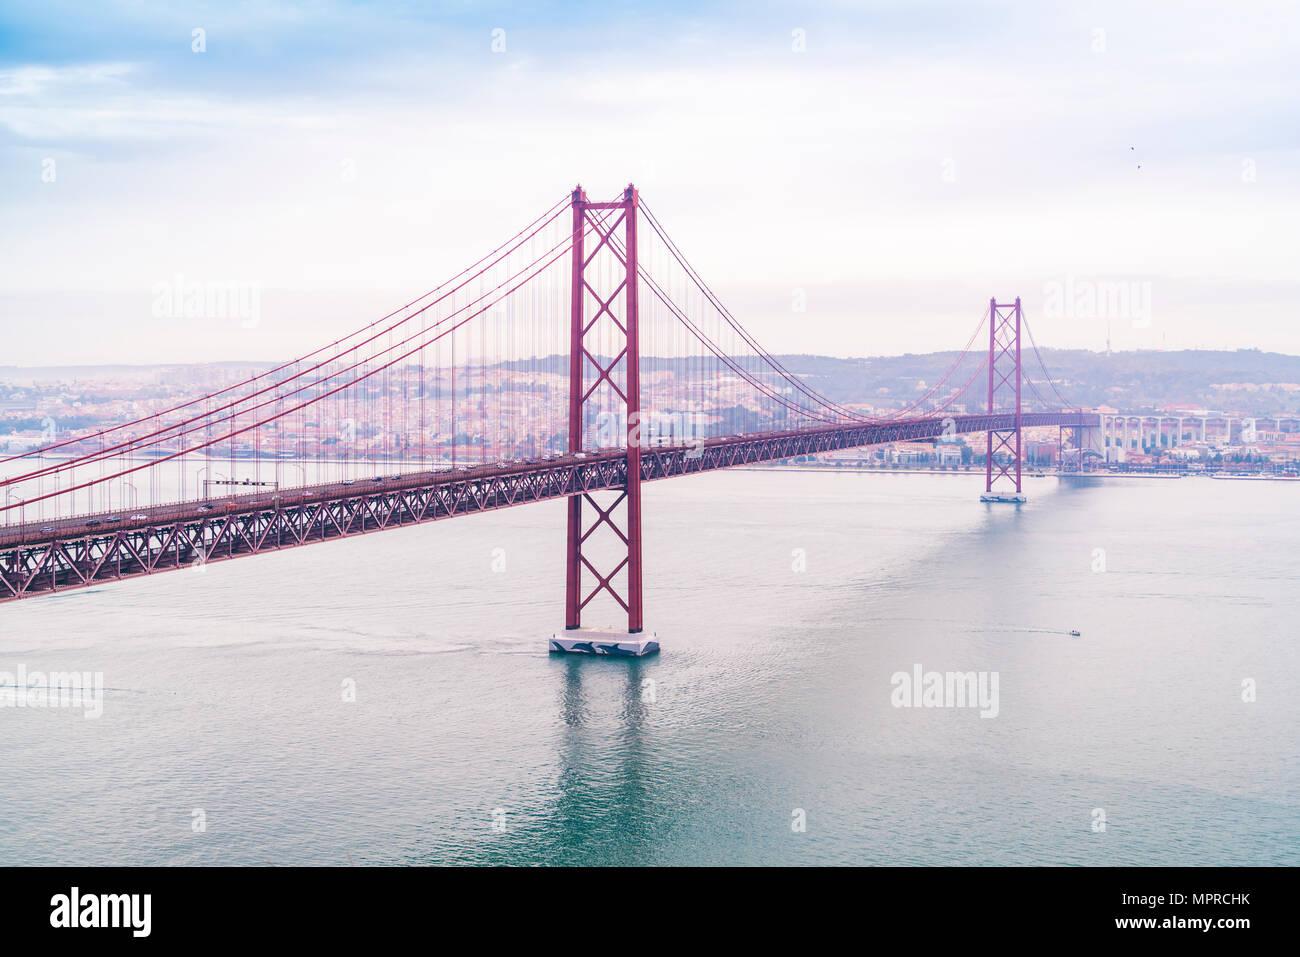 Portugal, Lisbon, Ponte 25 de Abril Stock Photo